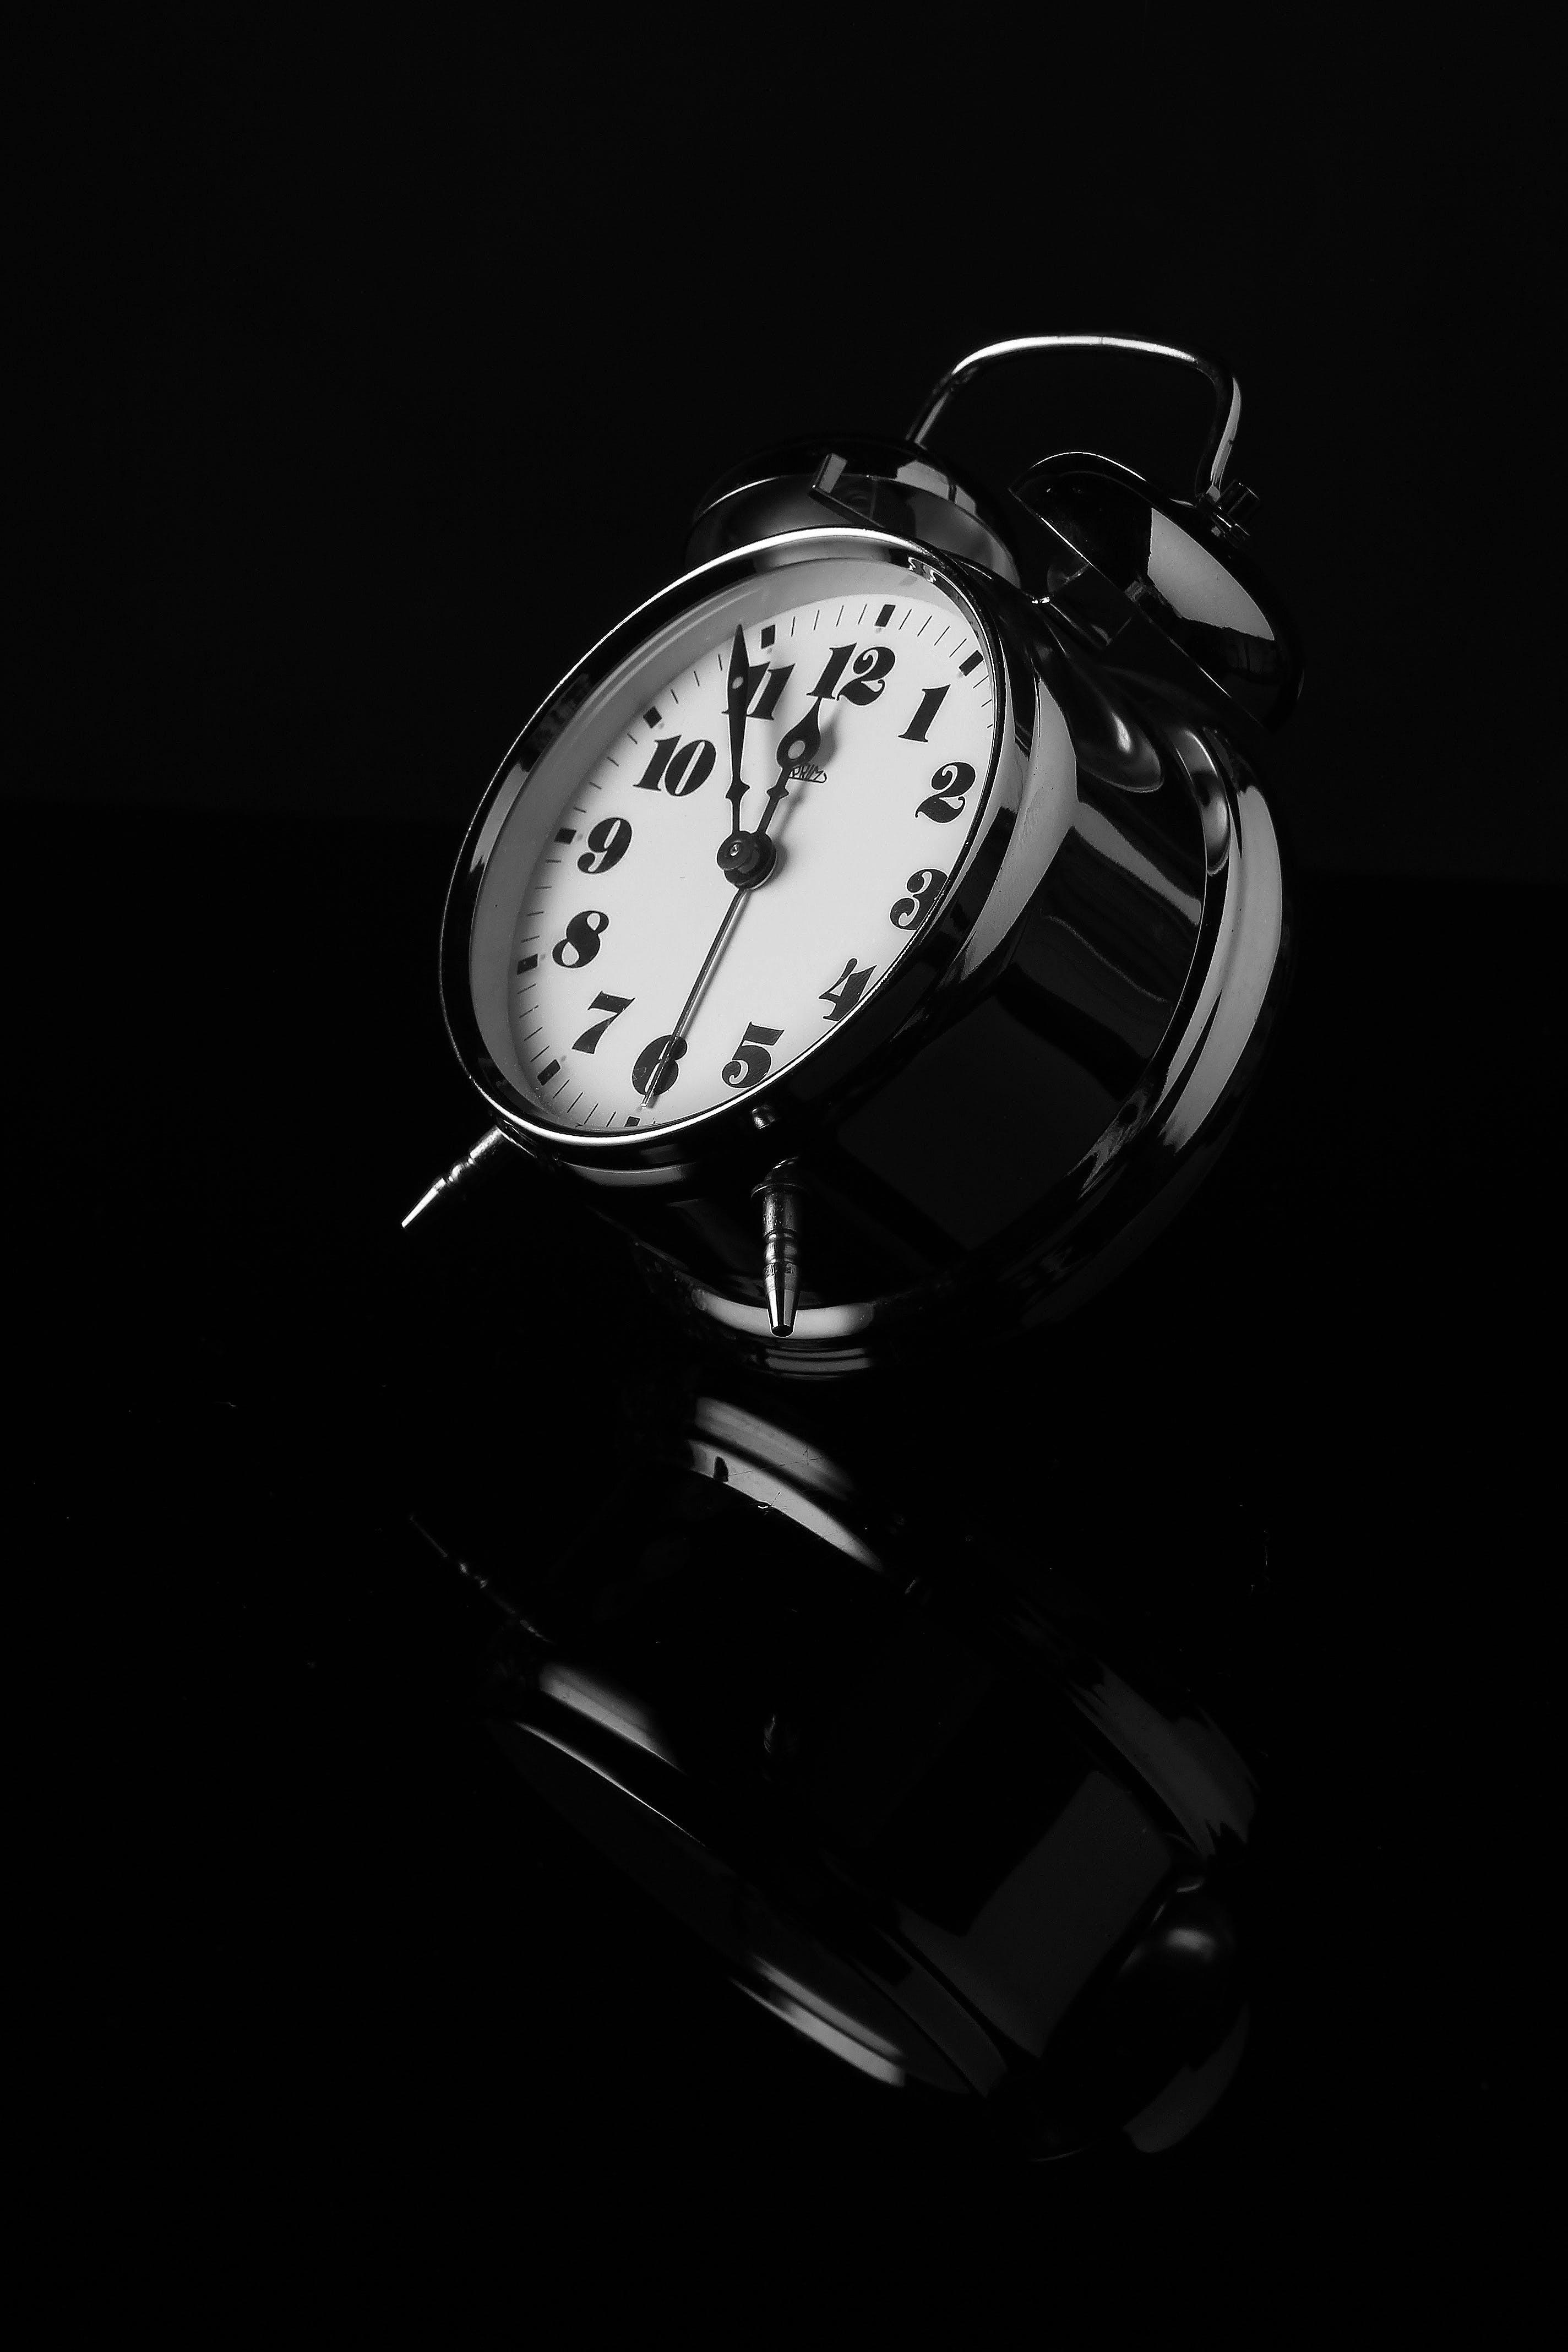 Black Analog Alarm Clock